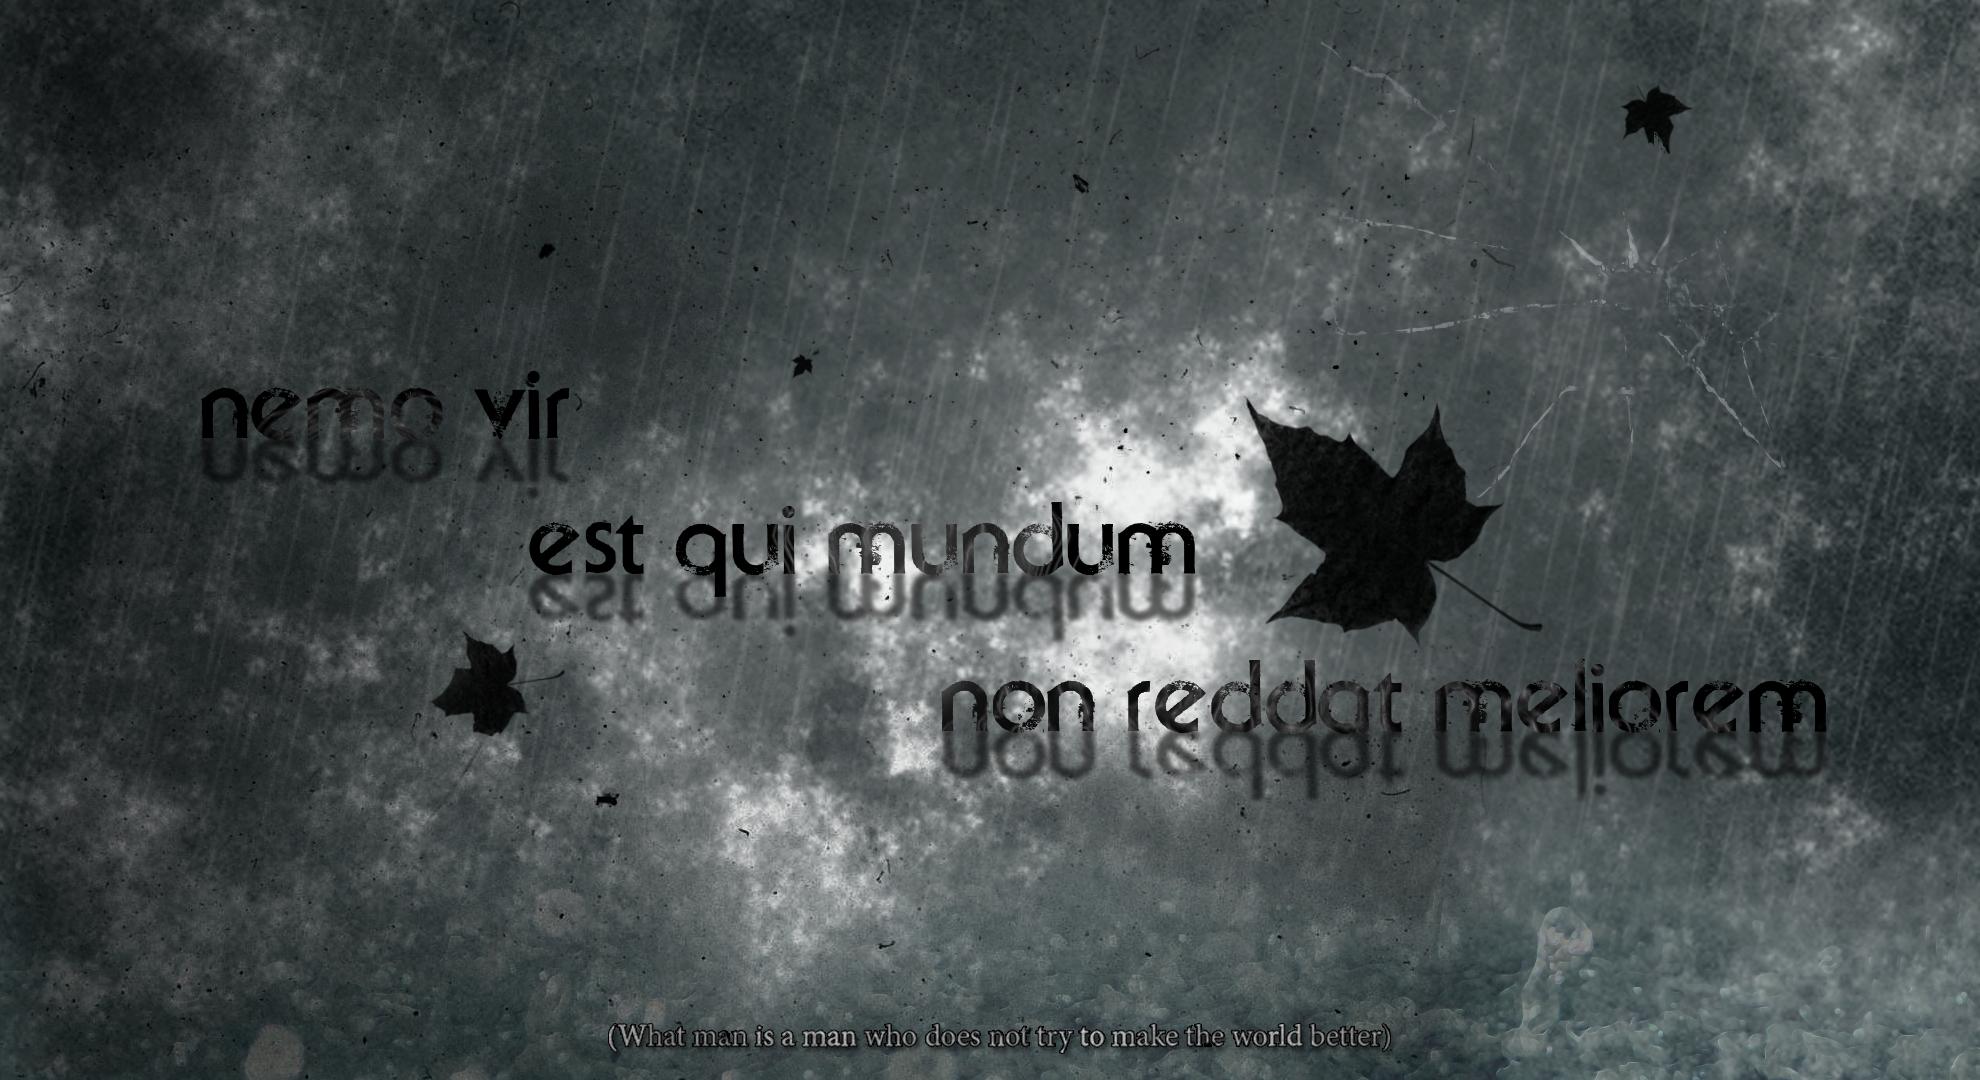 Wallpaper : quote, text, Moon, texture, universe, Kingdom of Heaven